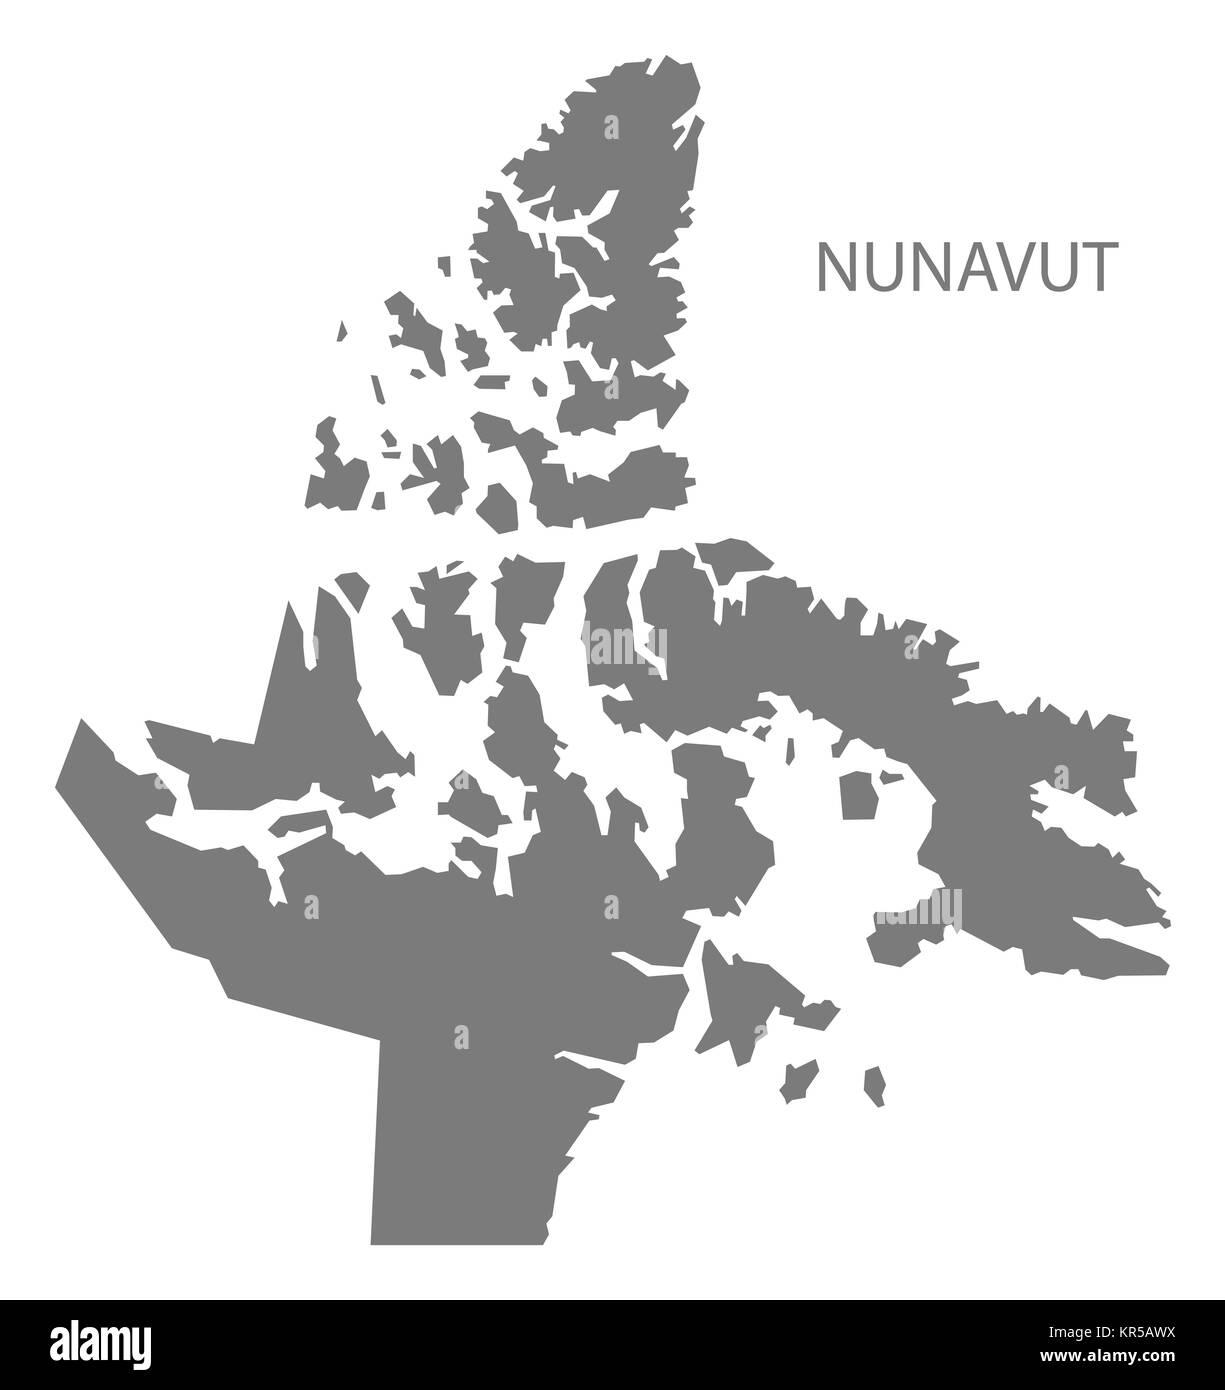 Map Of Canada Nunavut.Nunavut Canada Map Grey Stock Photo 169148726 Alamy